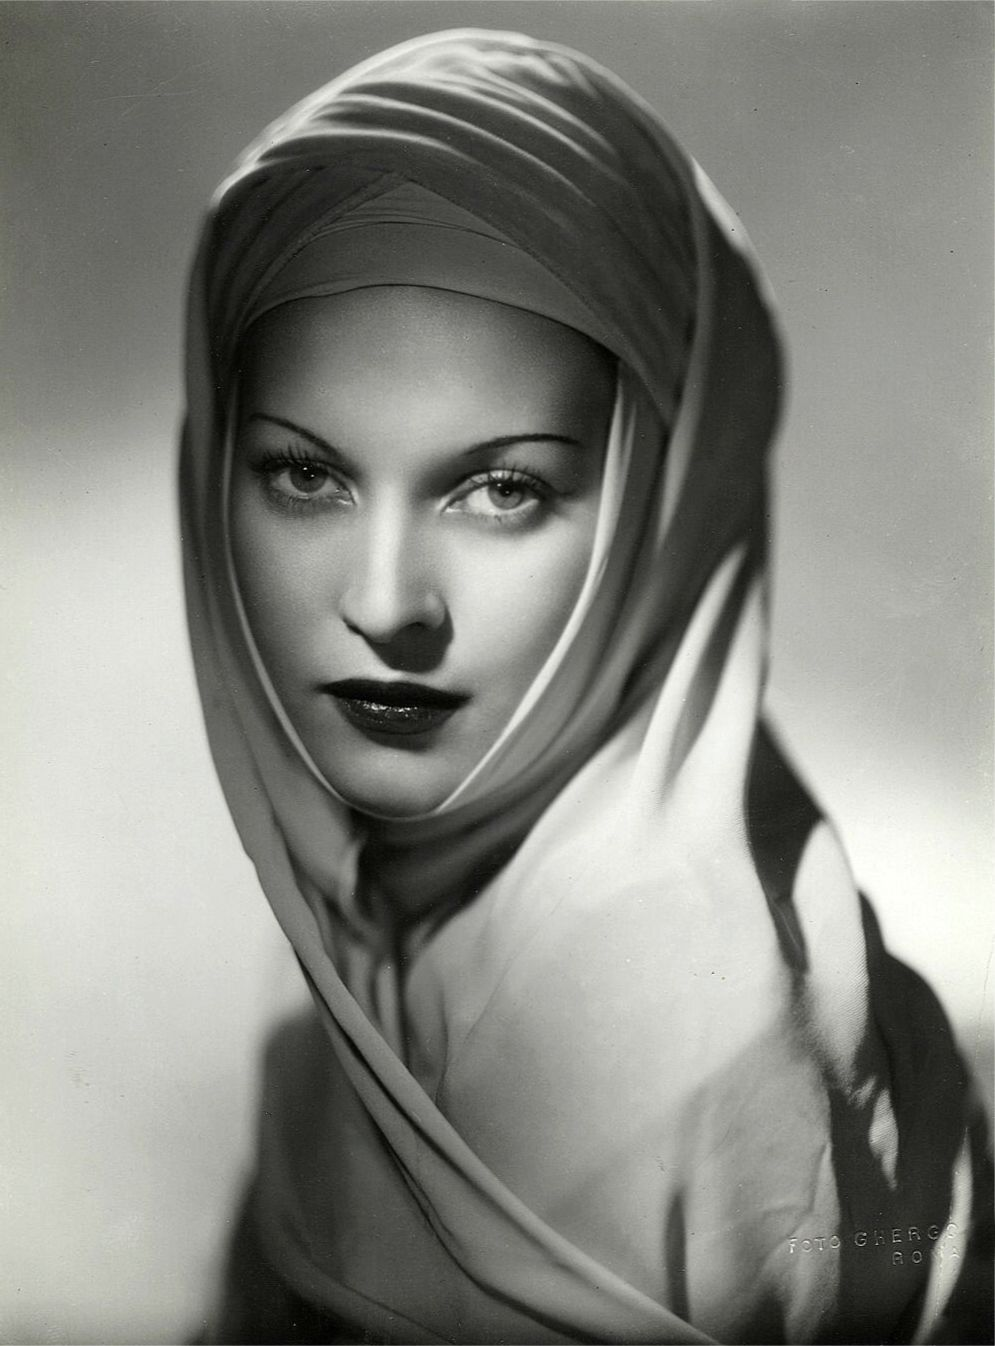 Italian actress Mariella Lotti, photo by Arturo Ghergo